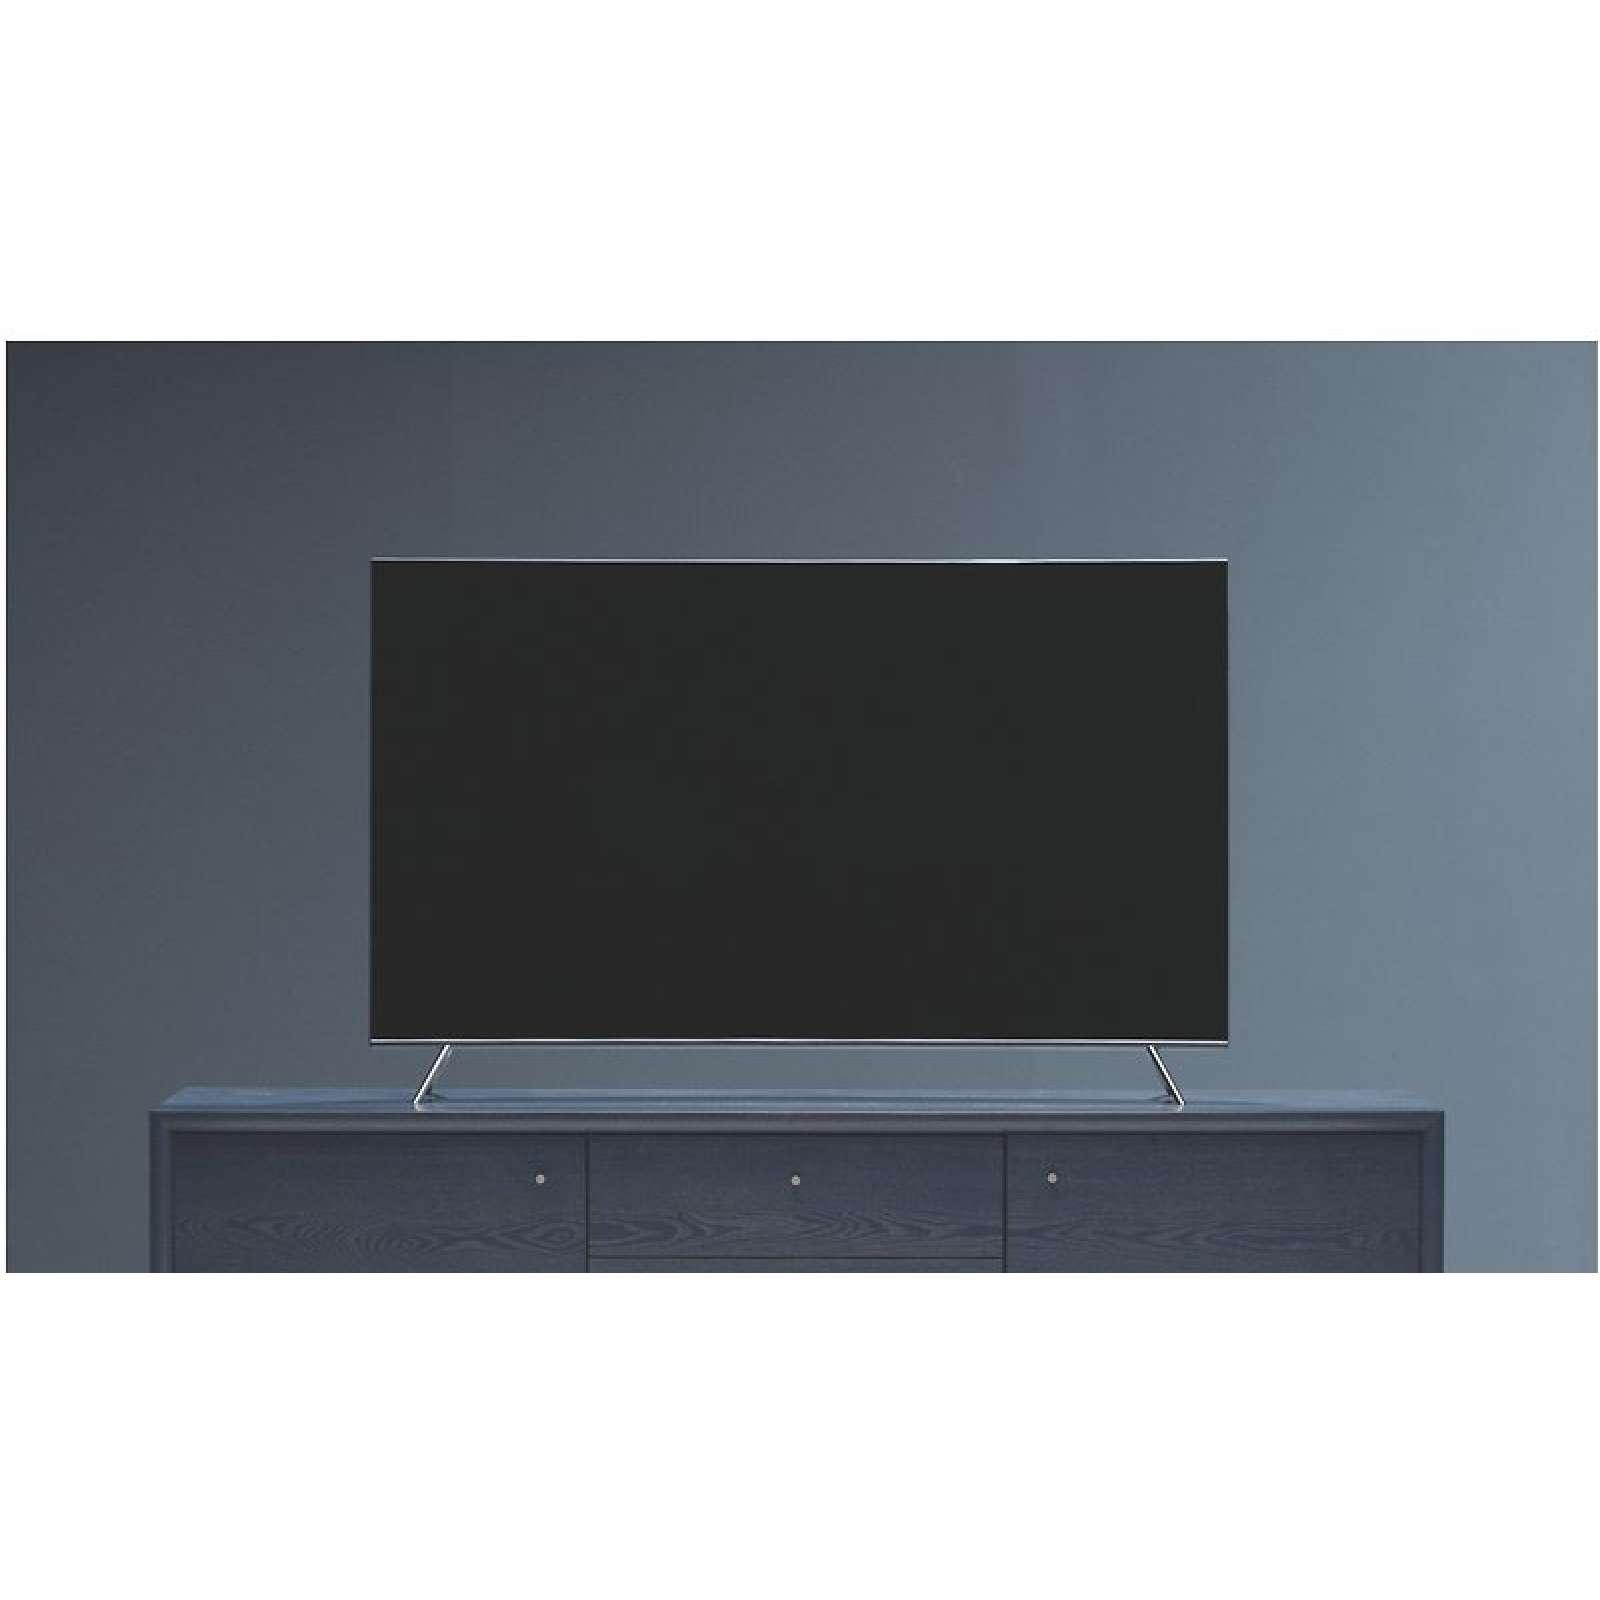 60 zoll samsung tv led fernseher elektro risch. Black Bedroom Furniture Sets. Home Design Ideas